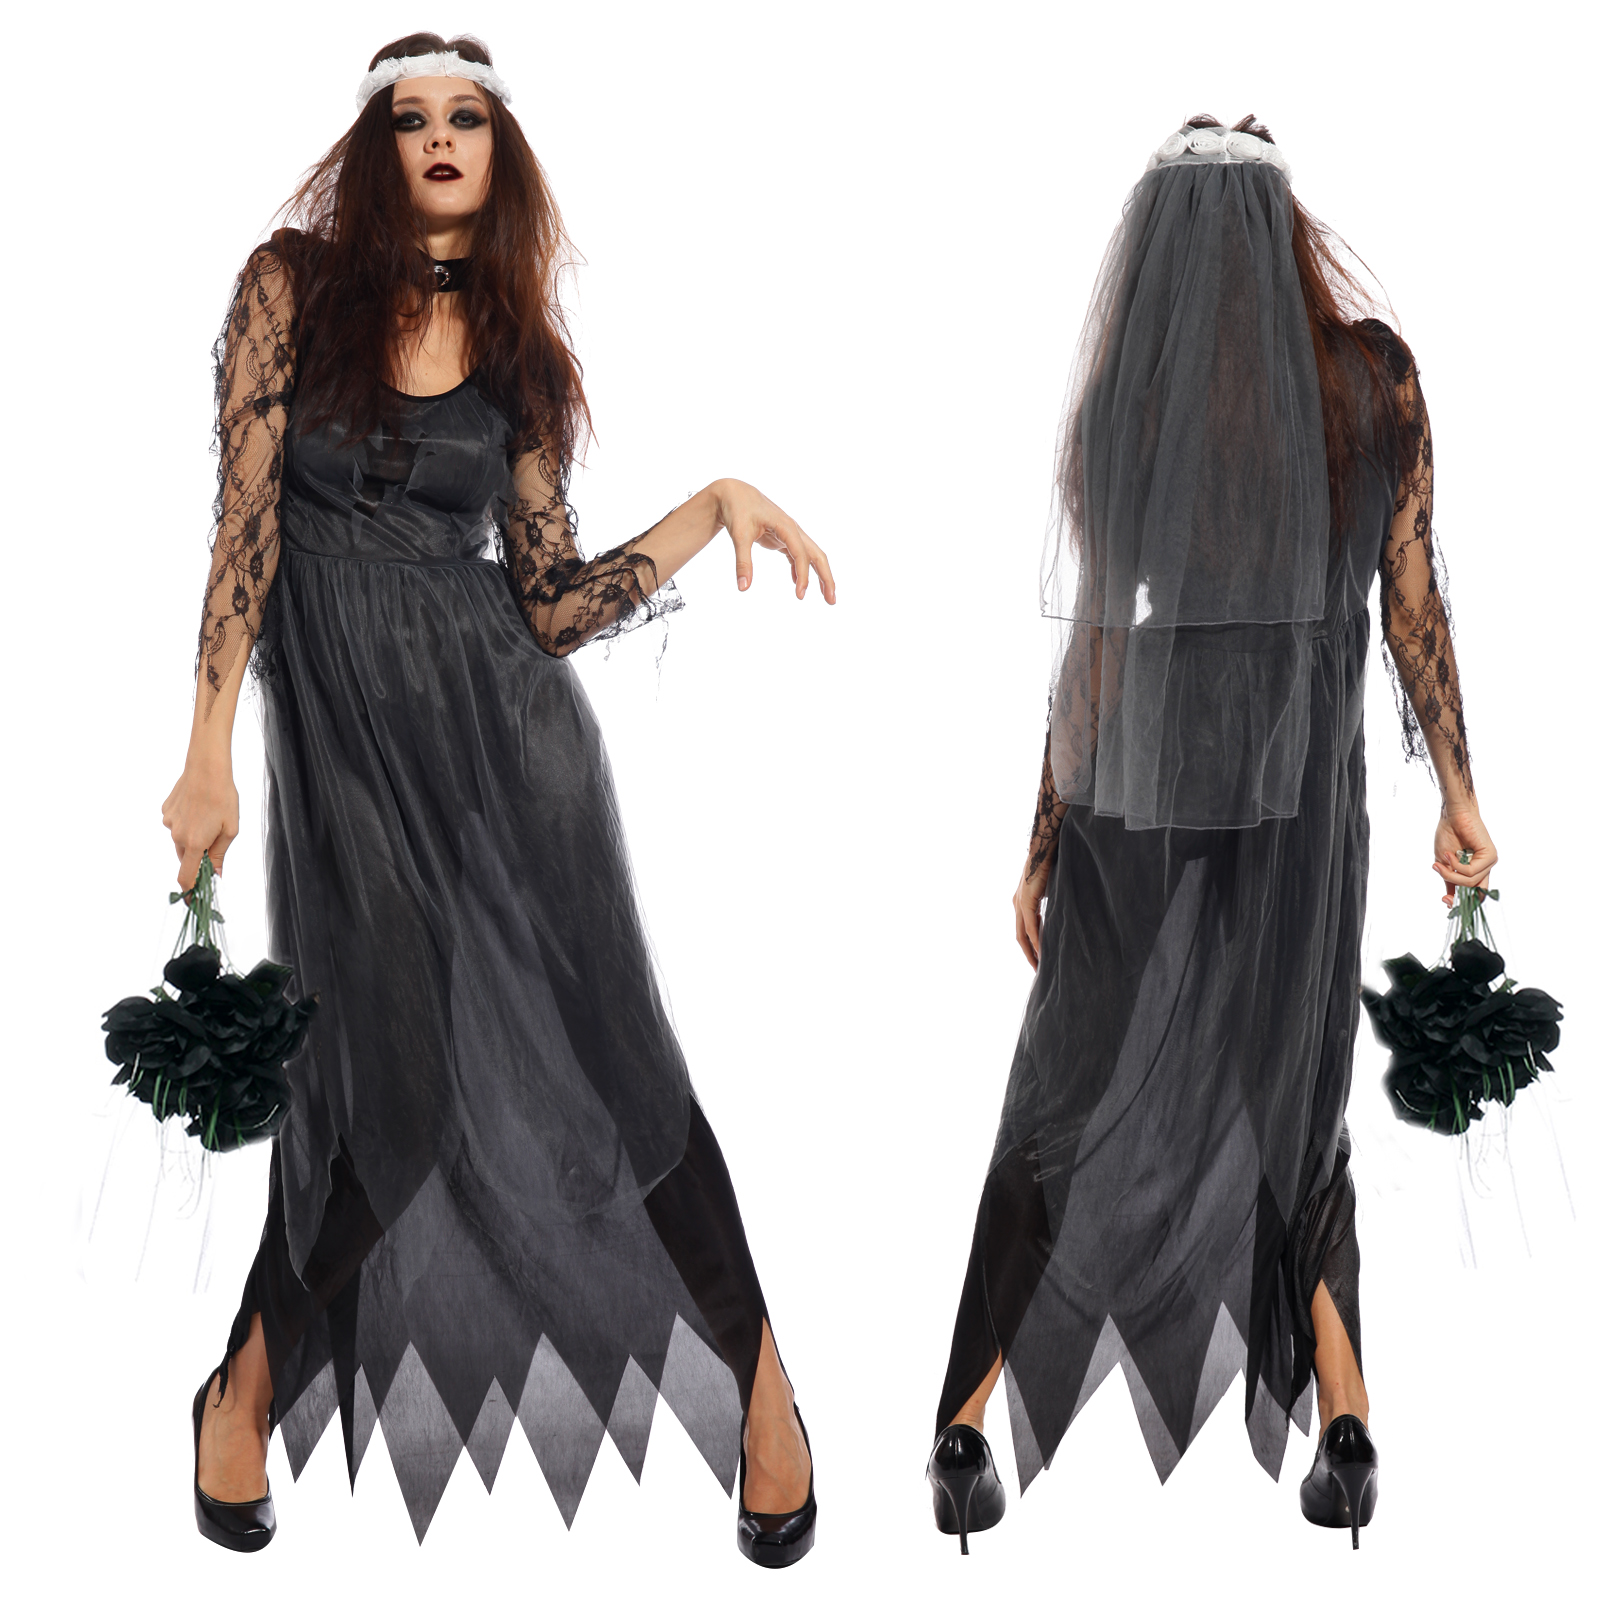 damen halloween outfits horror karneval kleid kost m zombie hexe vampir geist ebay. Black Bedroom Furniture Sets. Home Design Ideas